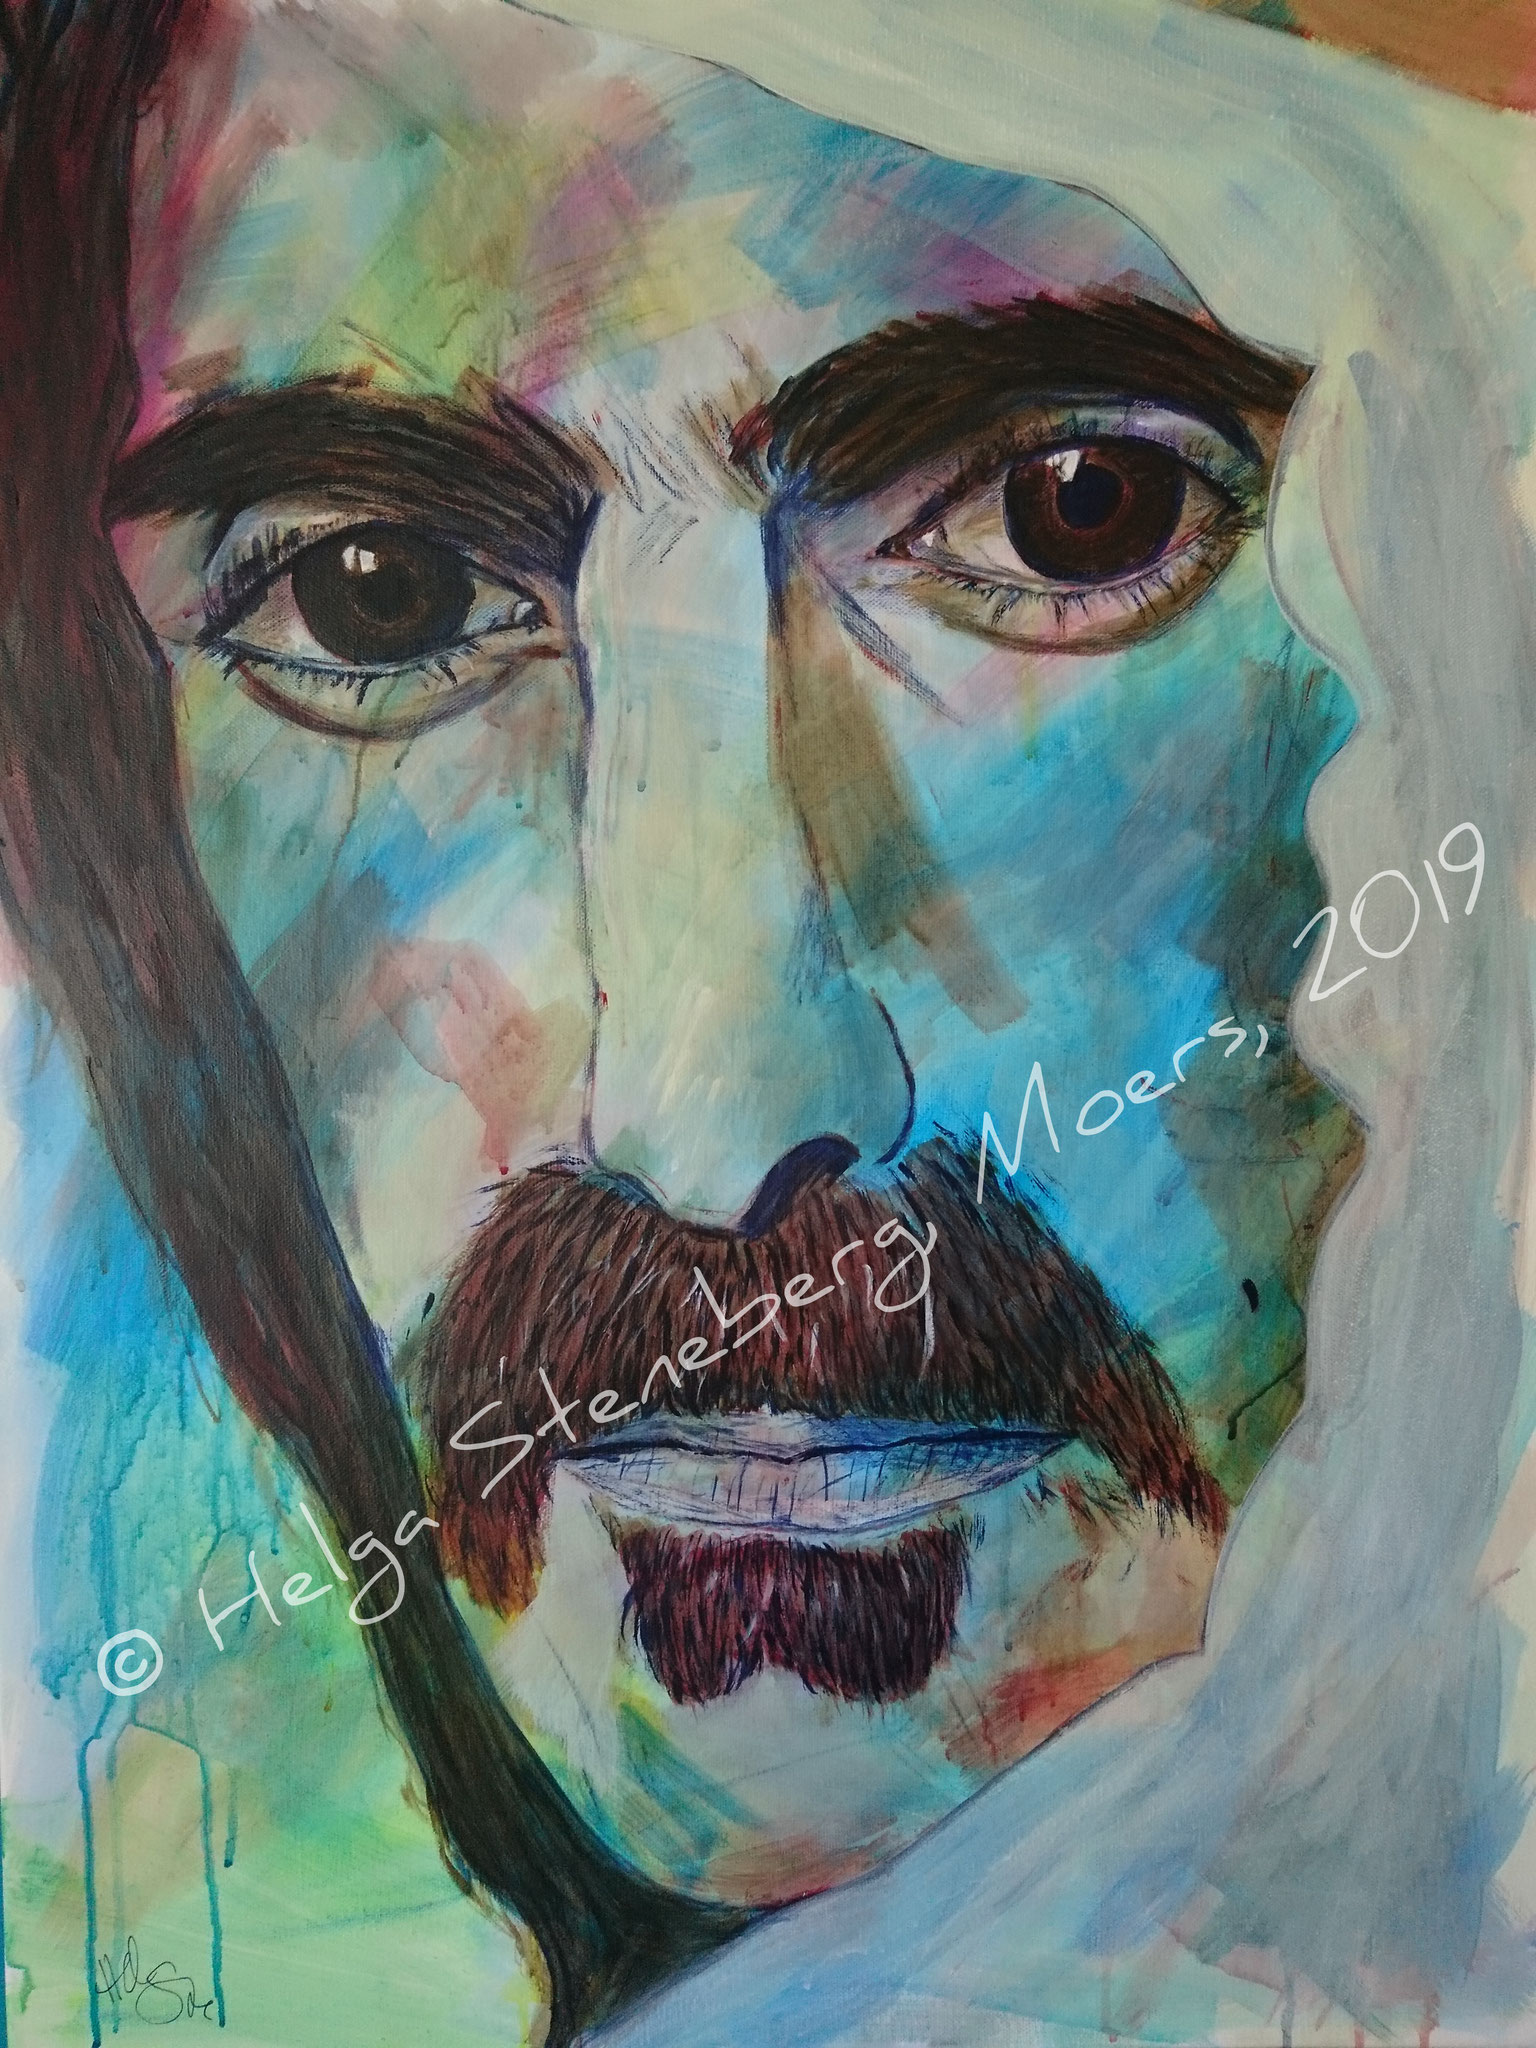 Frank Zappa, 80x60, LW - vorgemerkt